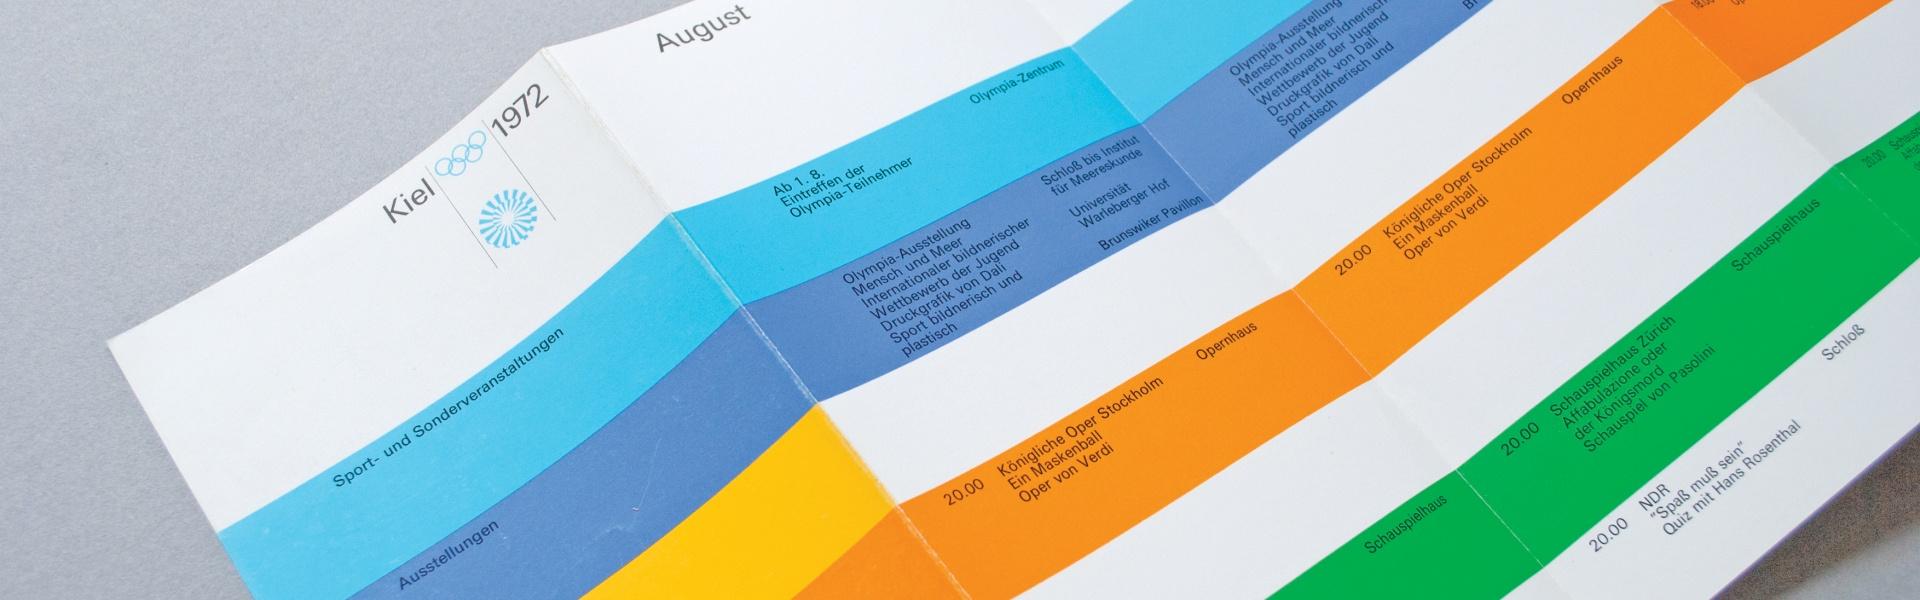 An insight into the Munich Olympics design